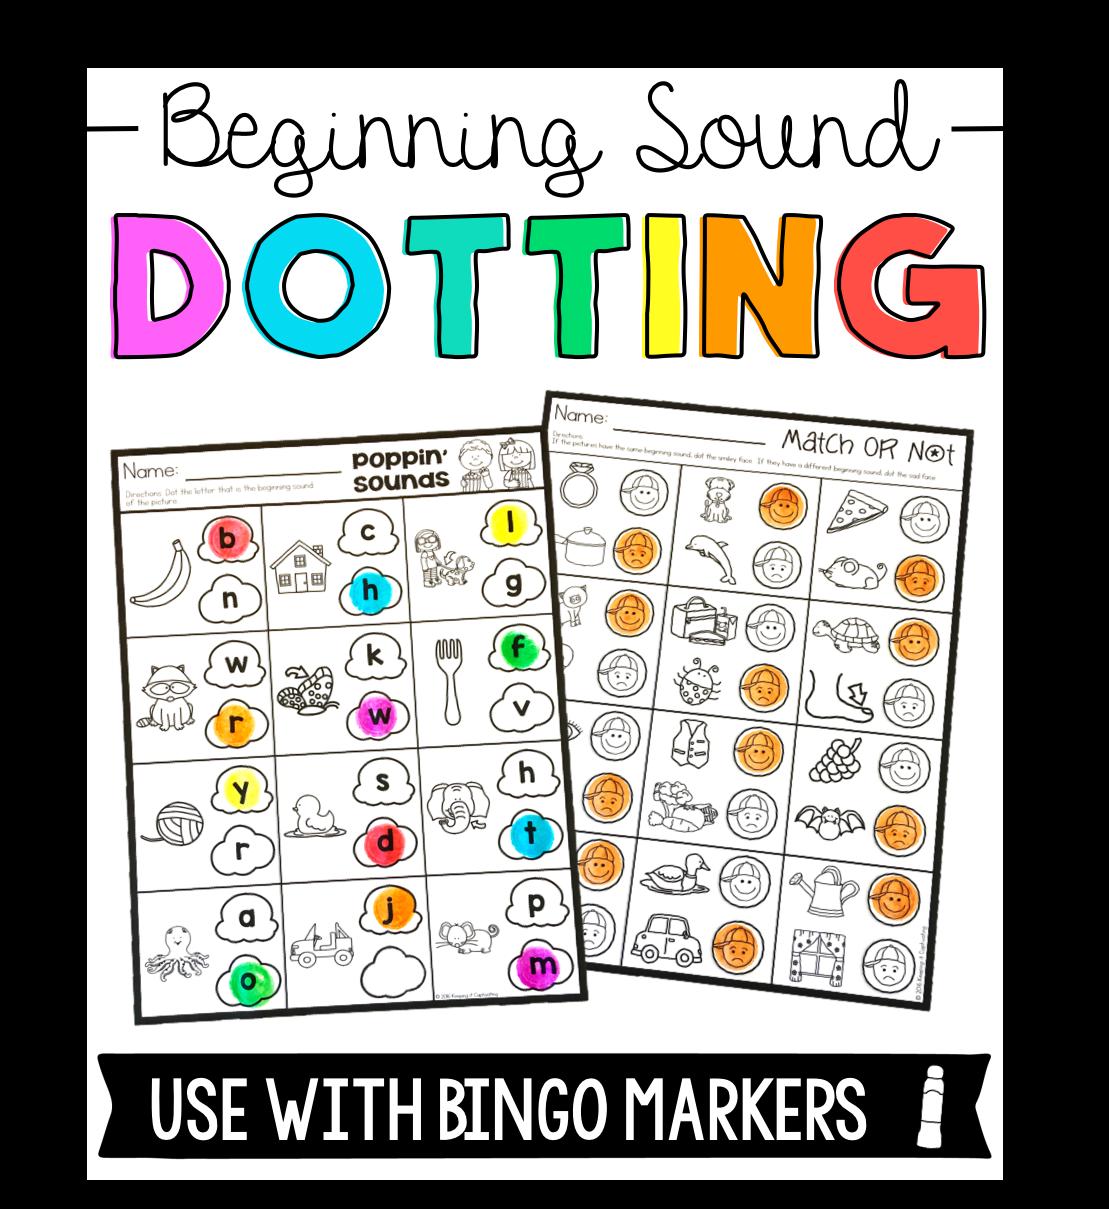 Beginning Sound Dotting